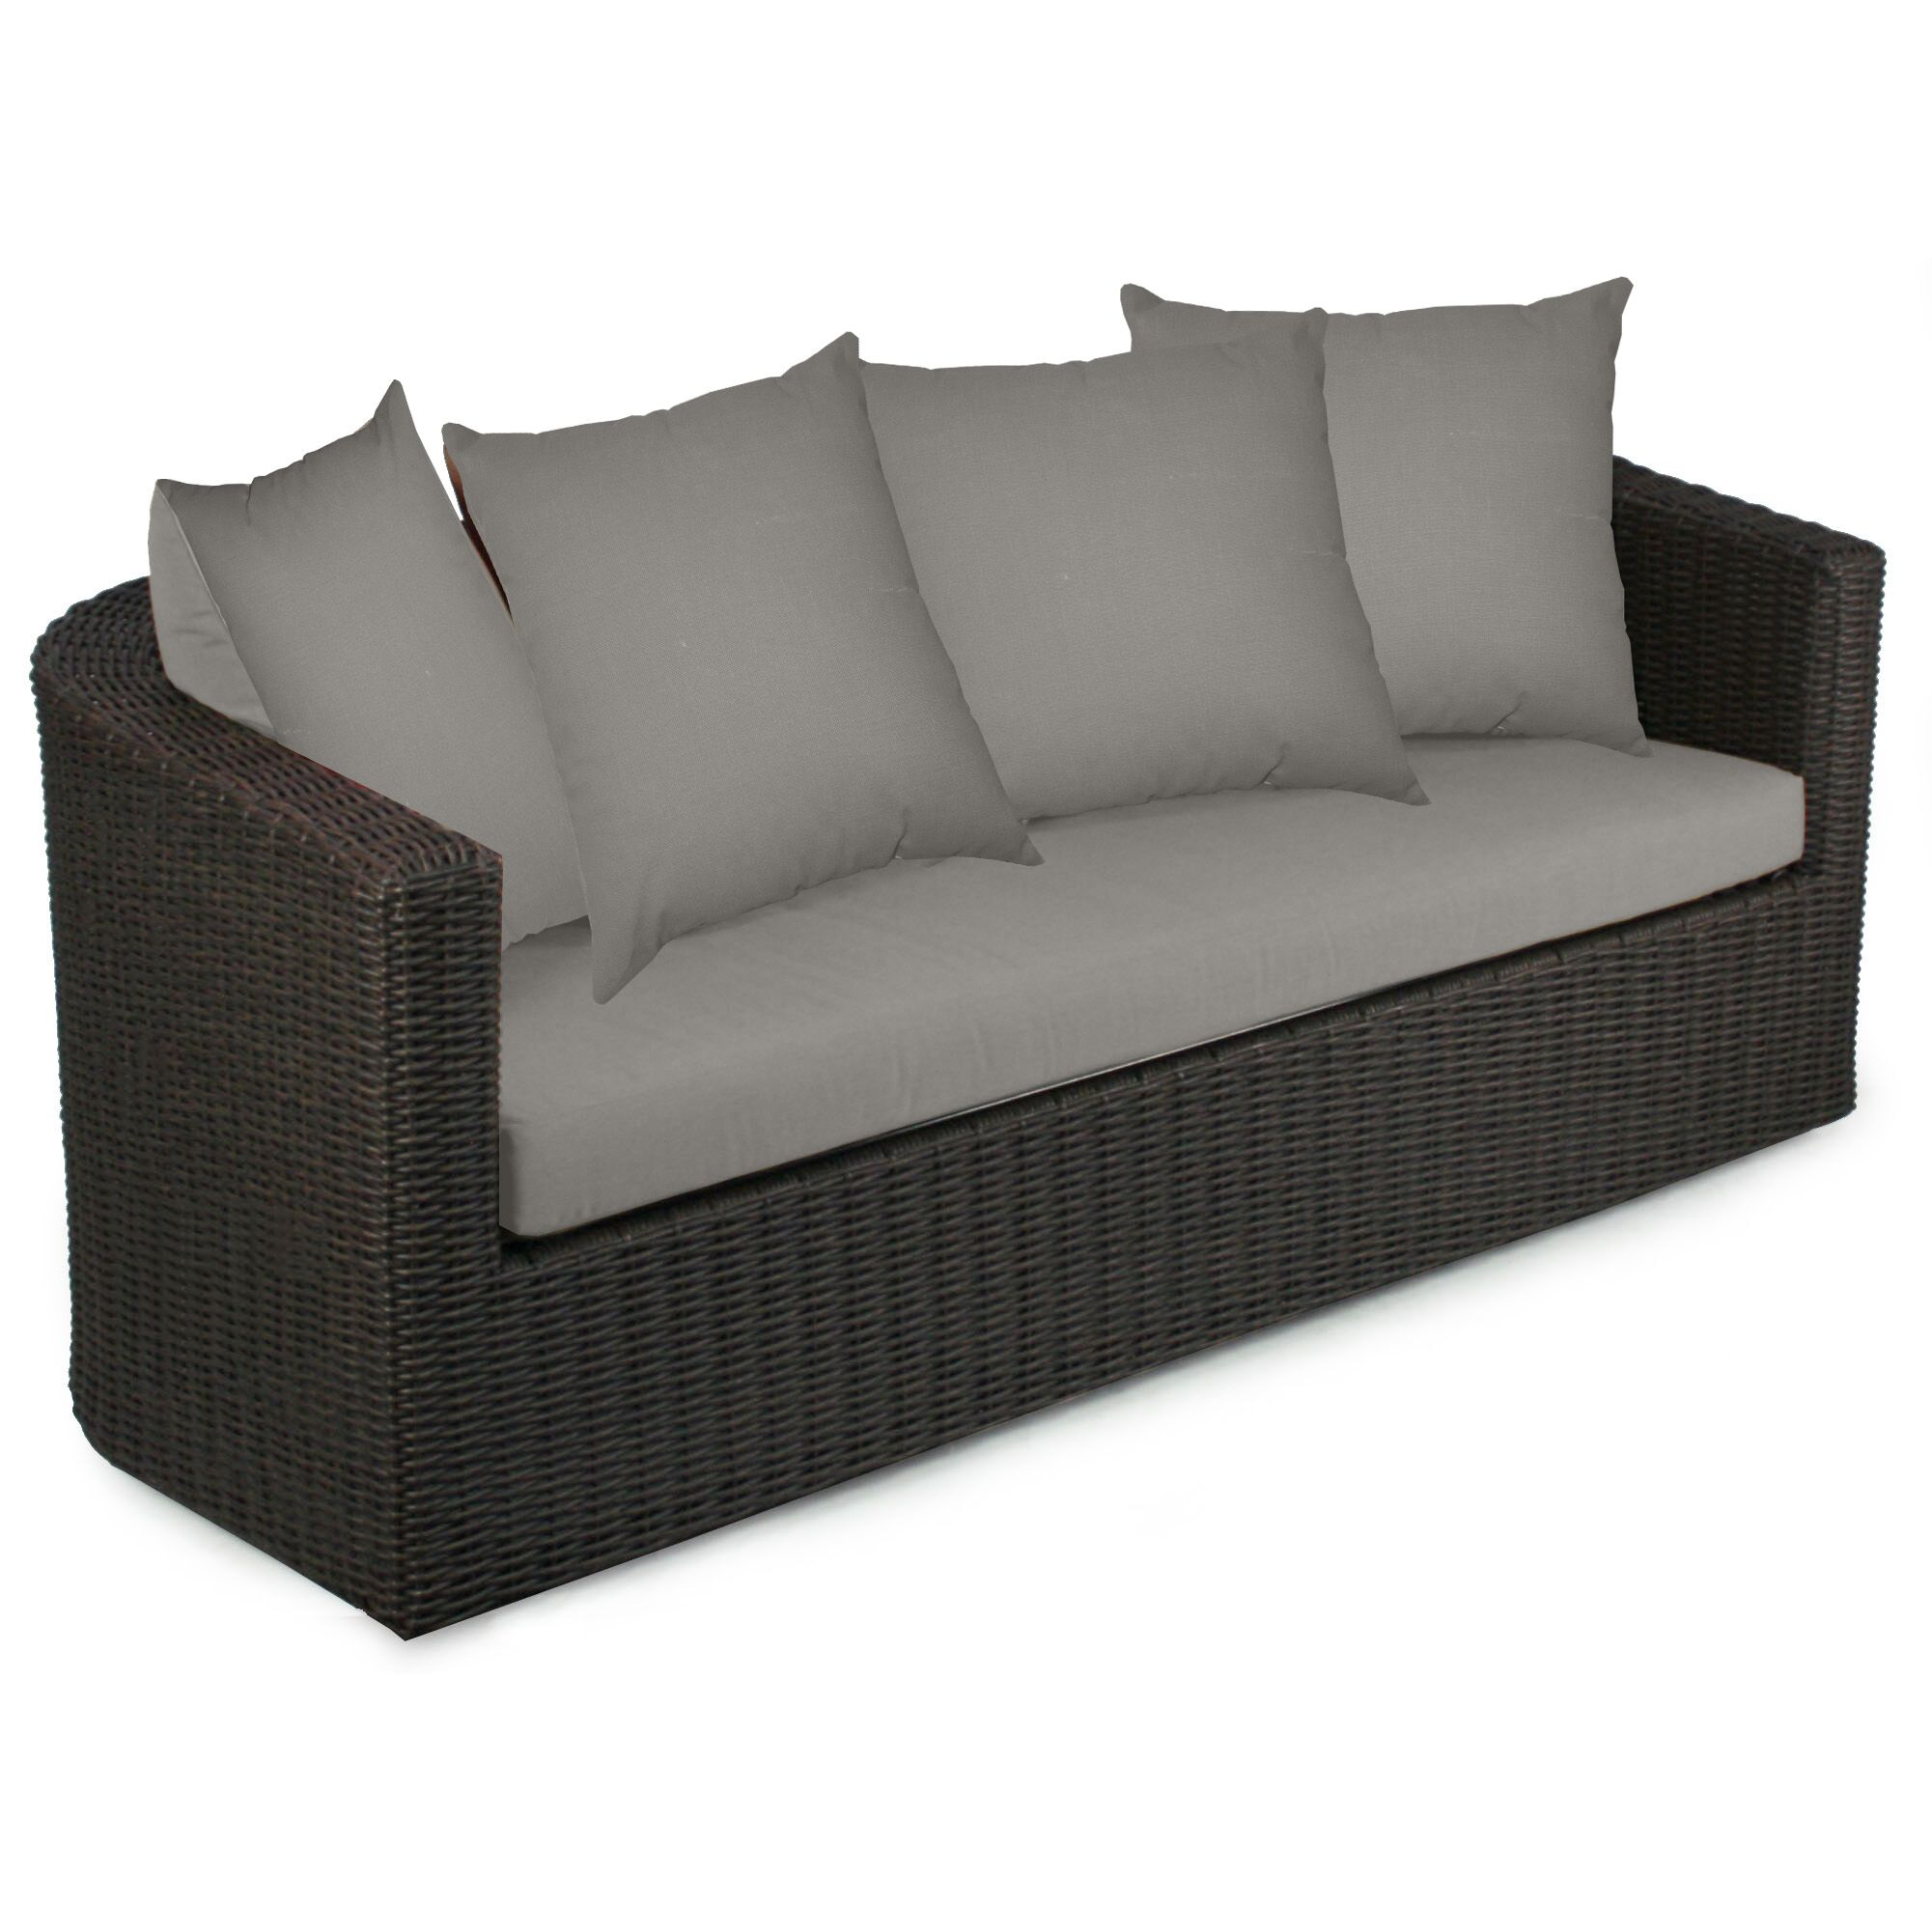 Palomar Sofa with Cushions Fabric: Graphite